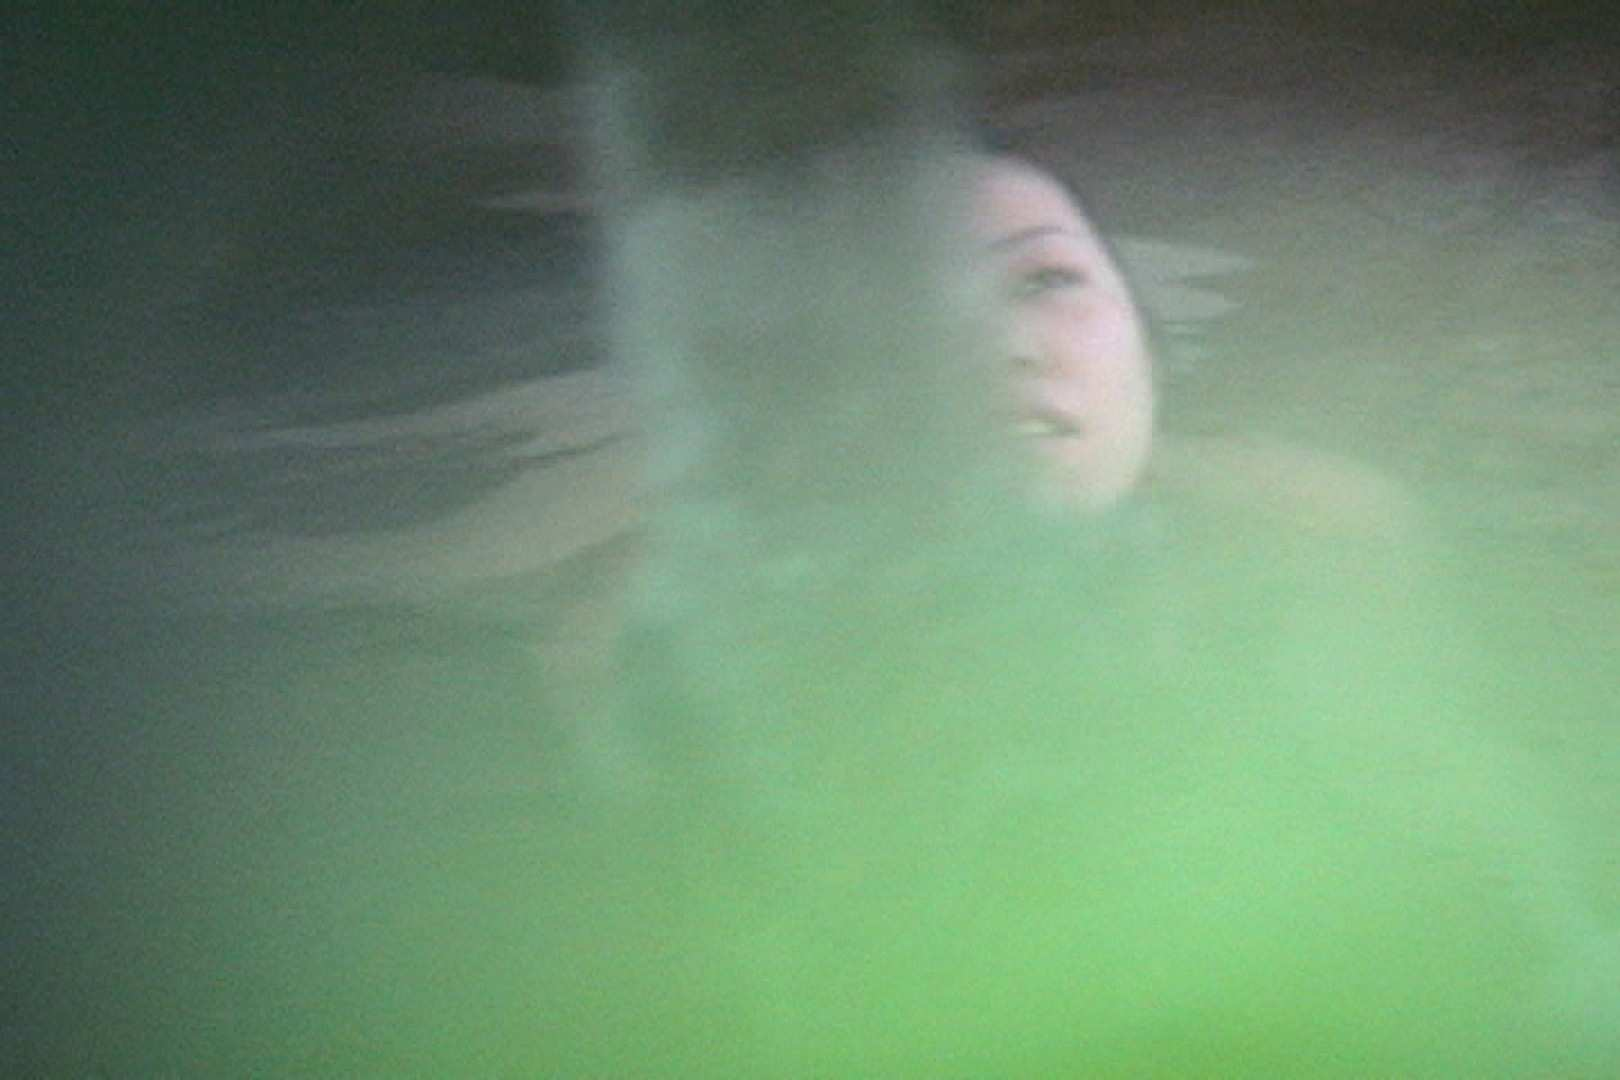 Aquaな露天風呂Vol.453 0  66連発 66